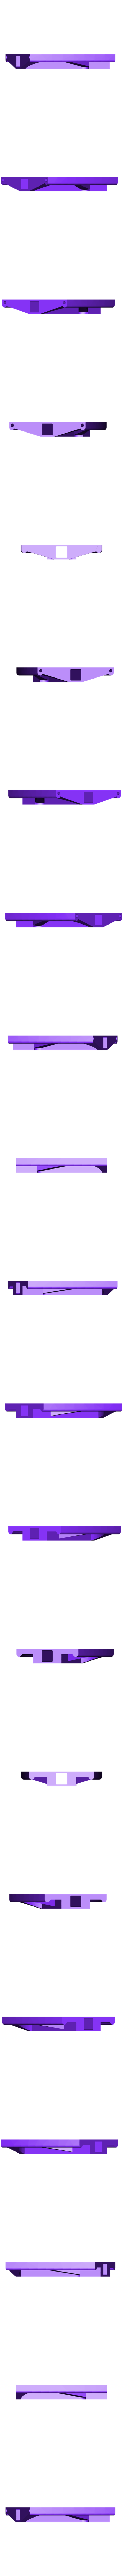 BOARD2.STL Download free STL file Pennyboard • 3D printing model, jaazasja